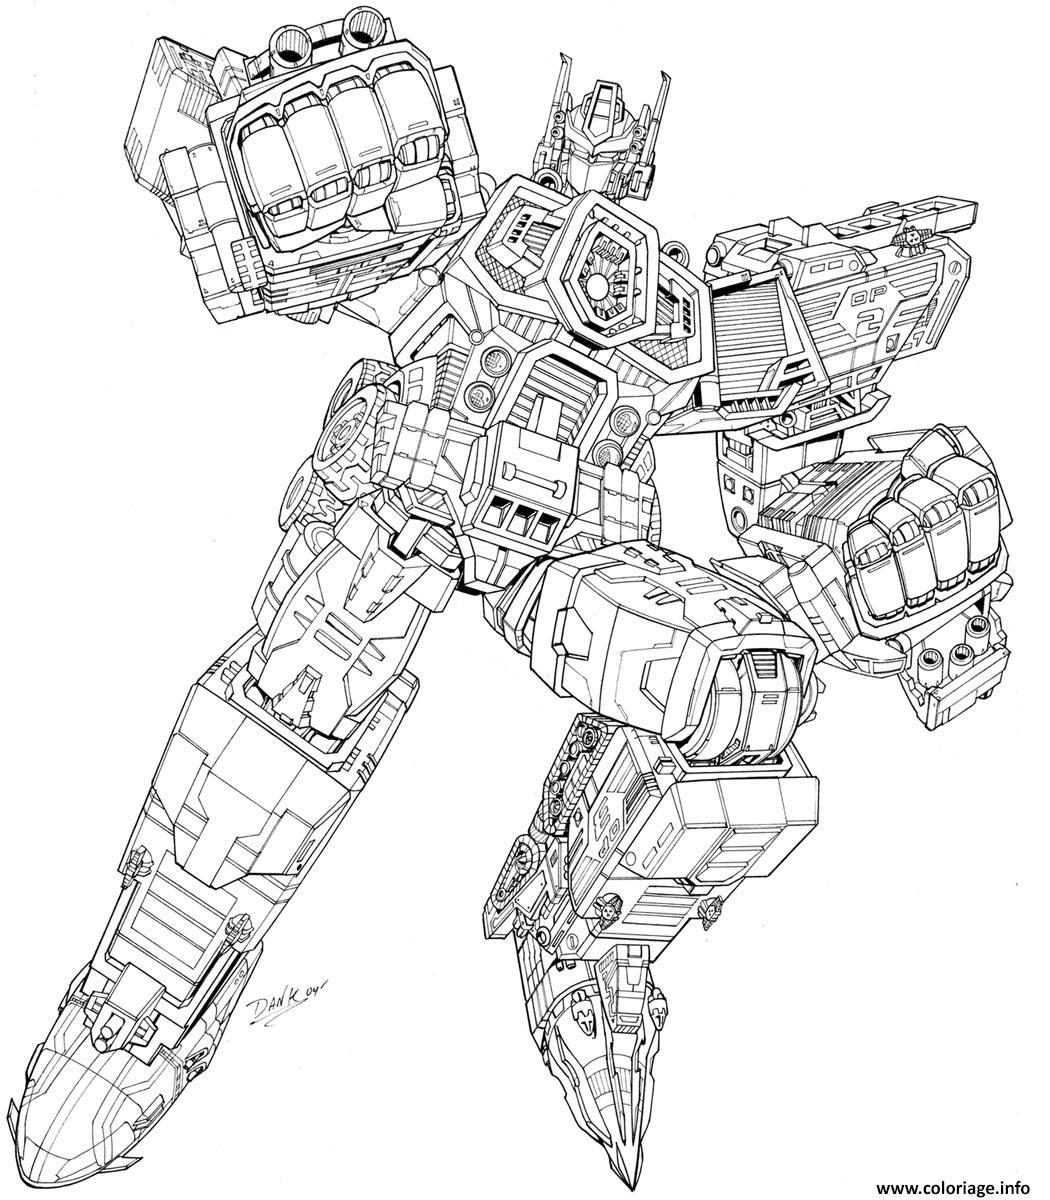 Coloriage Transformers Robots Complexe Dessin